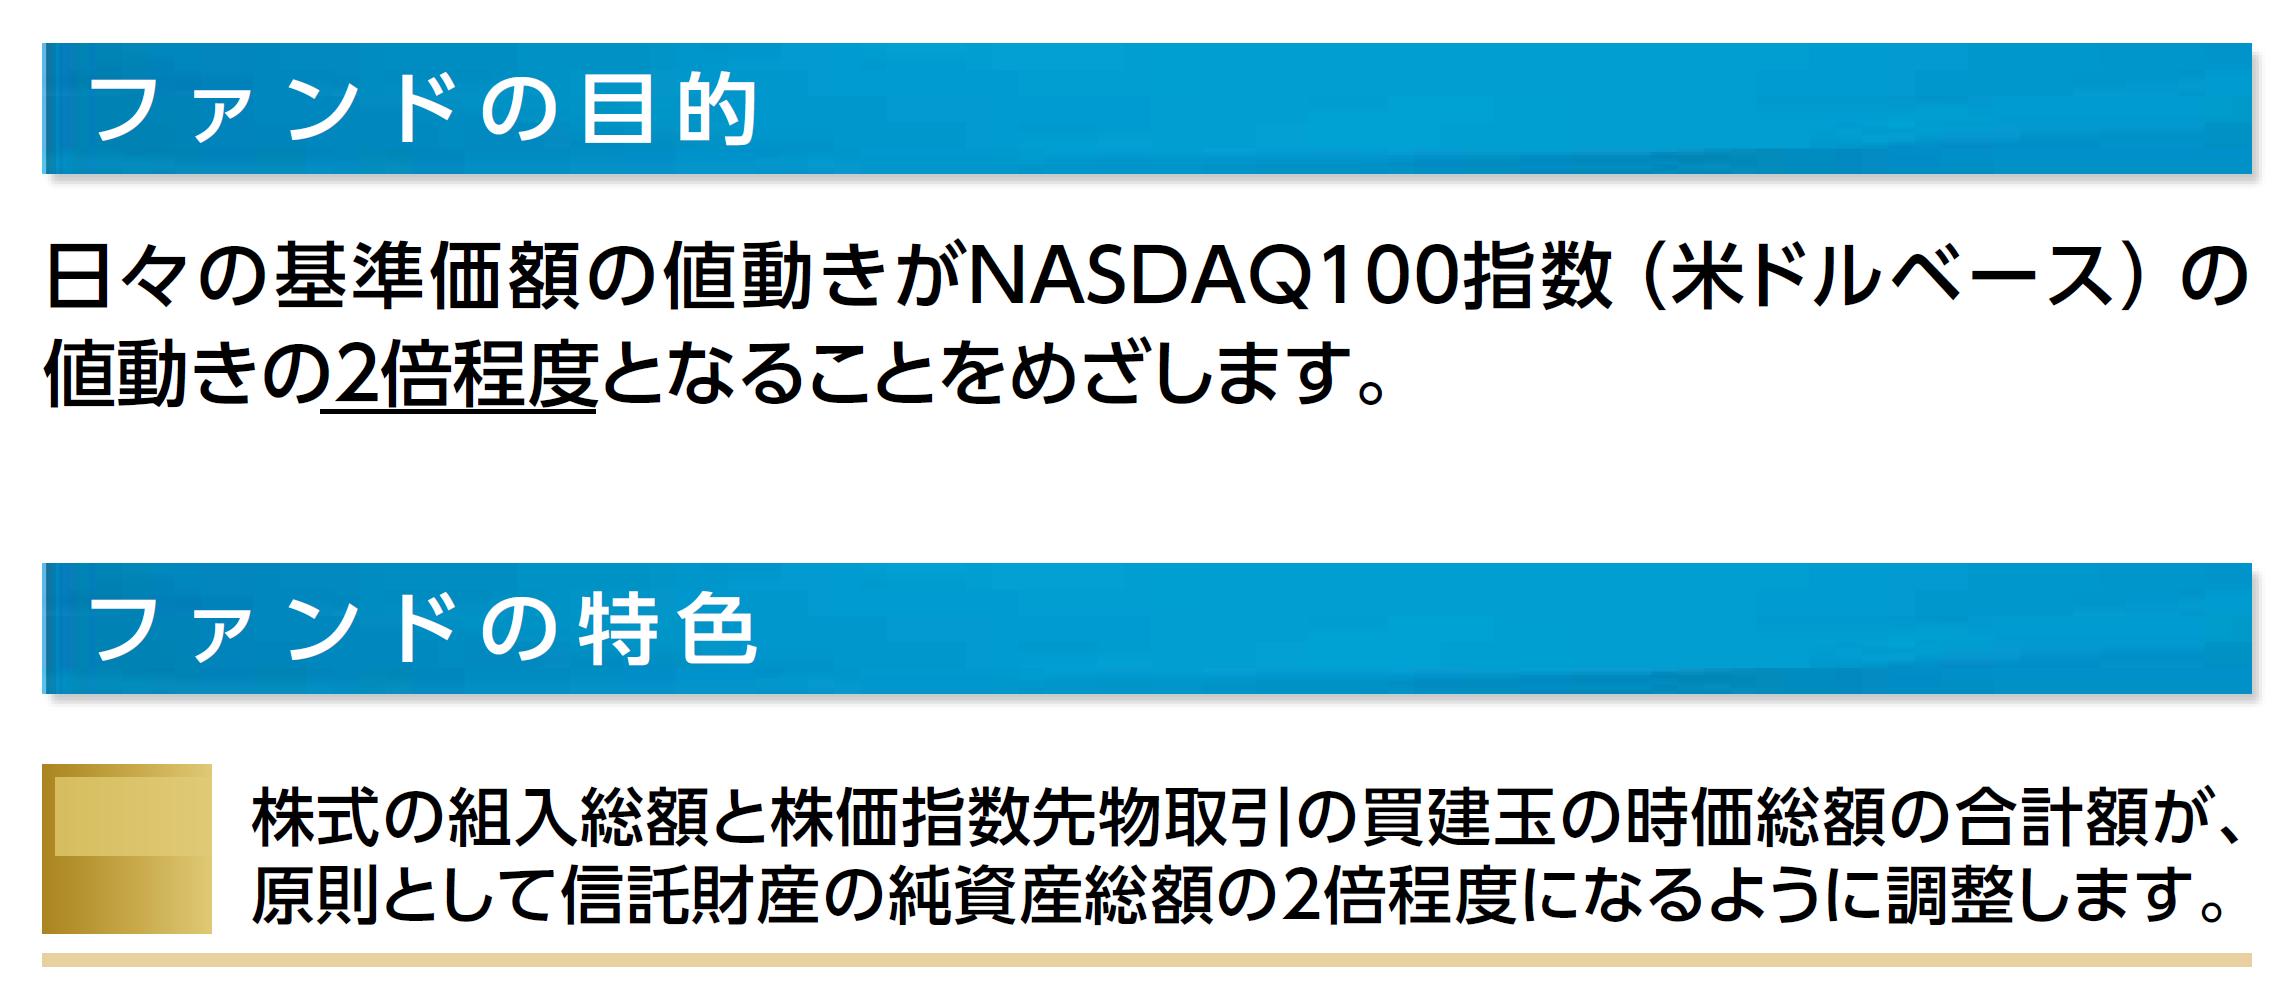 f:id:hodo-work:20201209200114p:plain